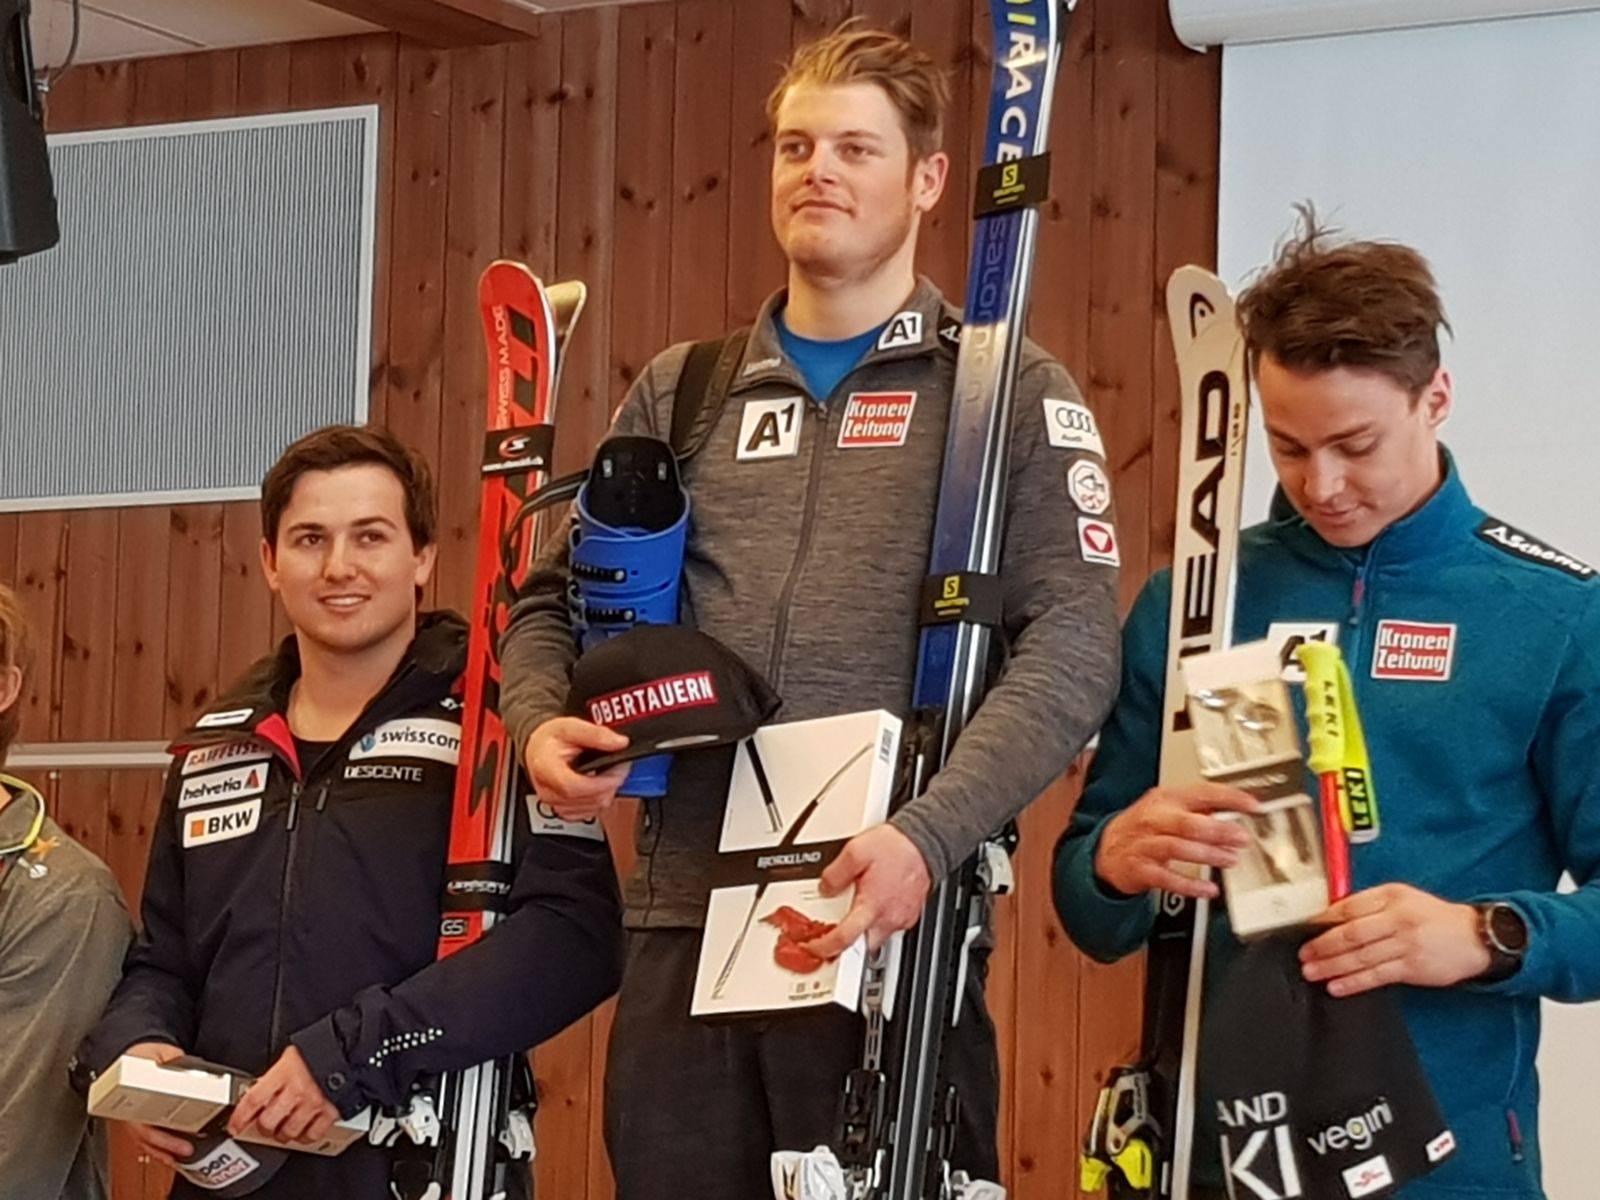 Podest 2. Europacupabfahrt v.l. Urs Kryenbühl, Christopher Neumayer & Christoph Krenn